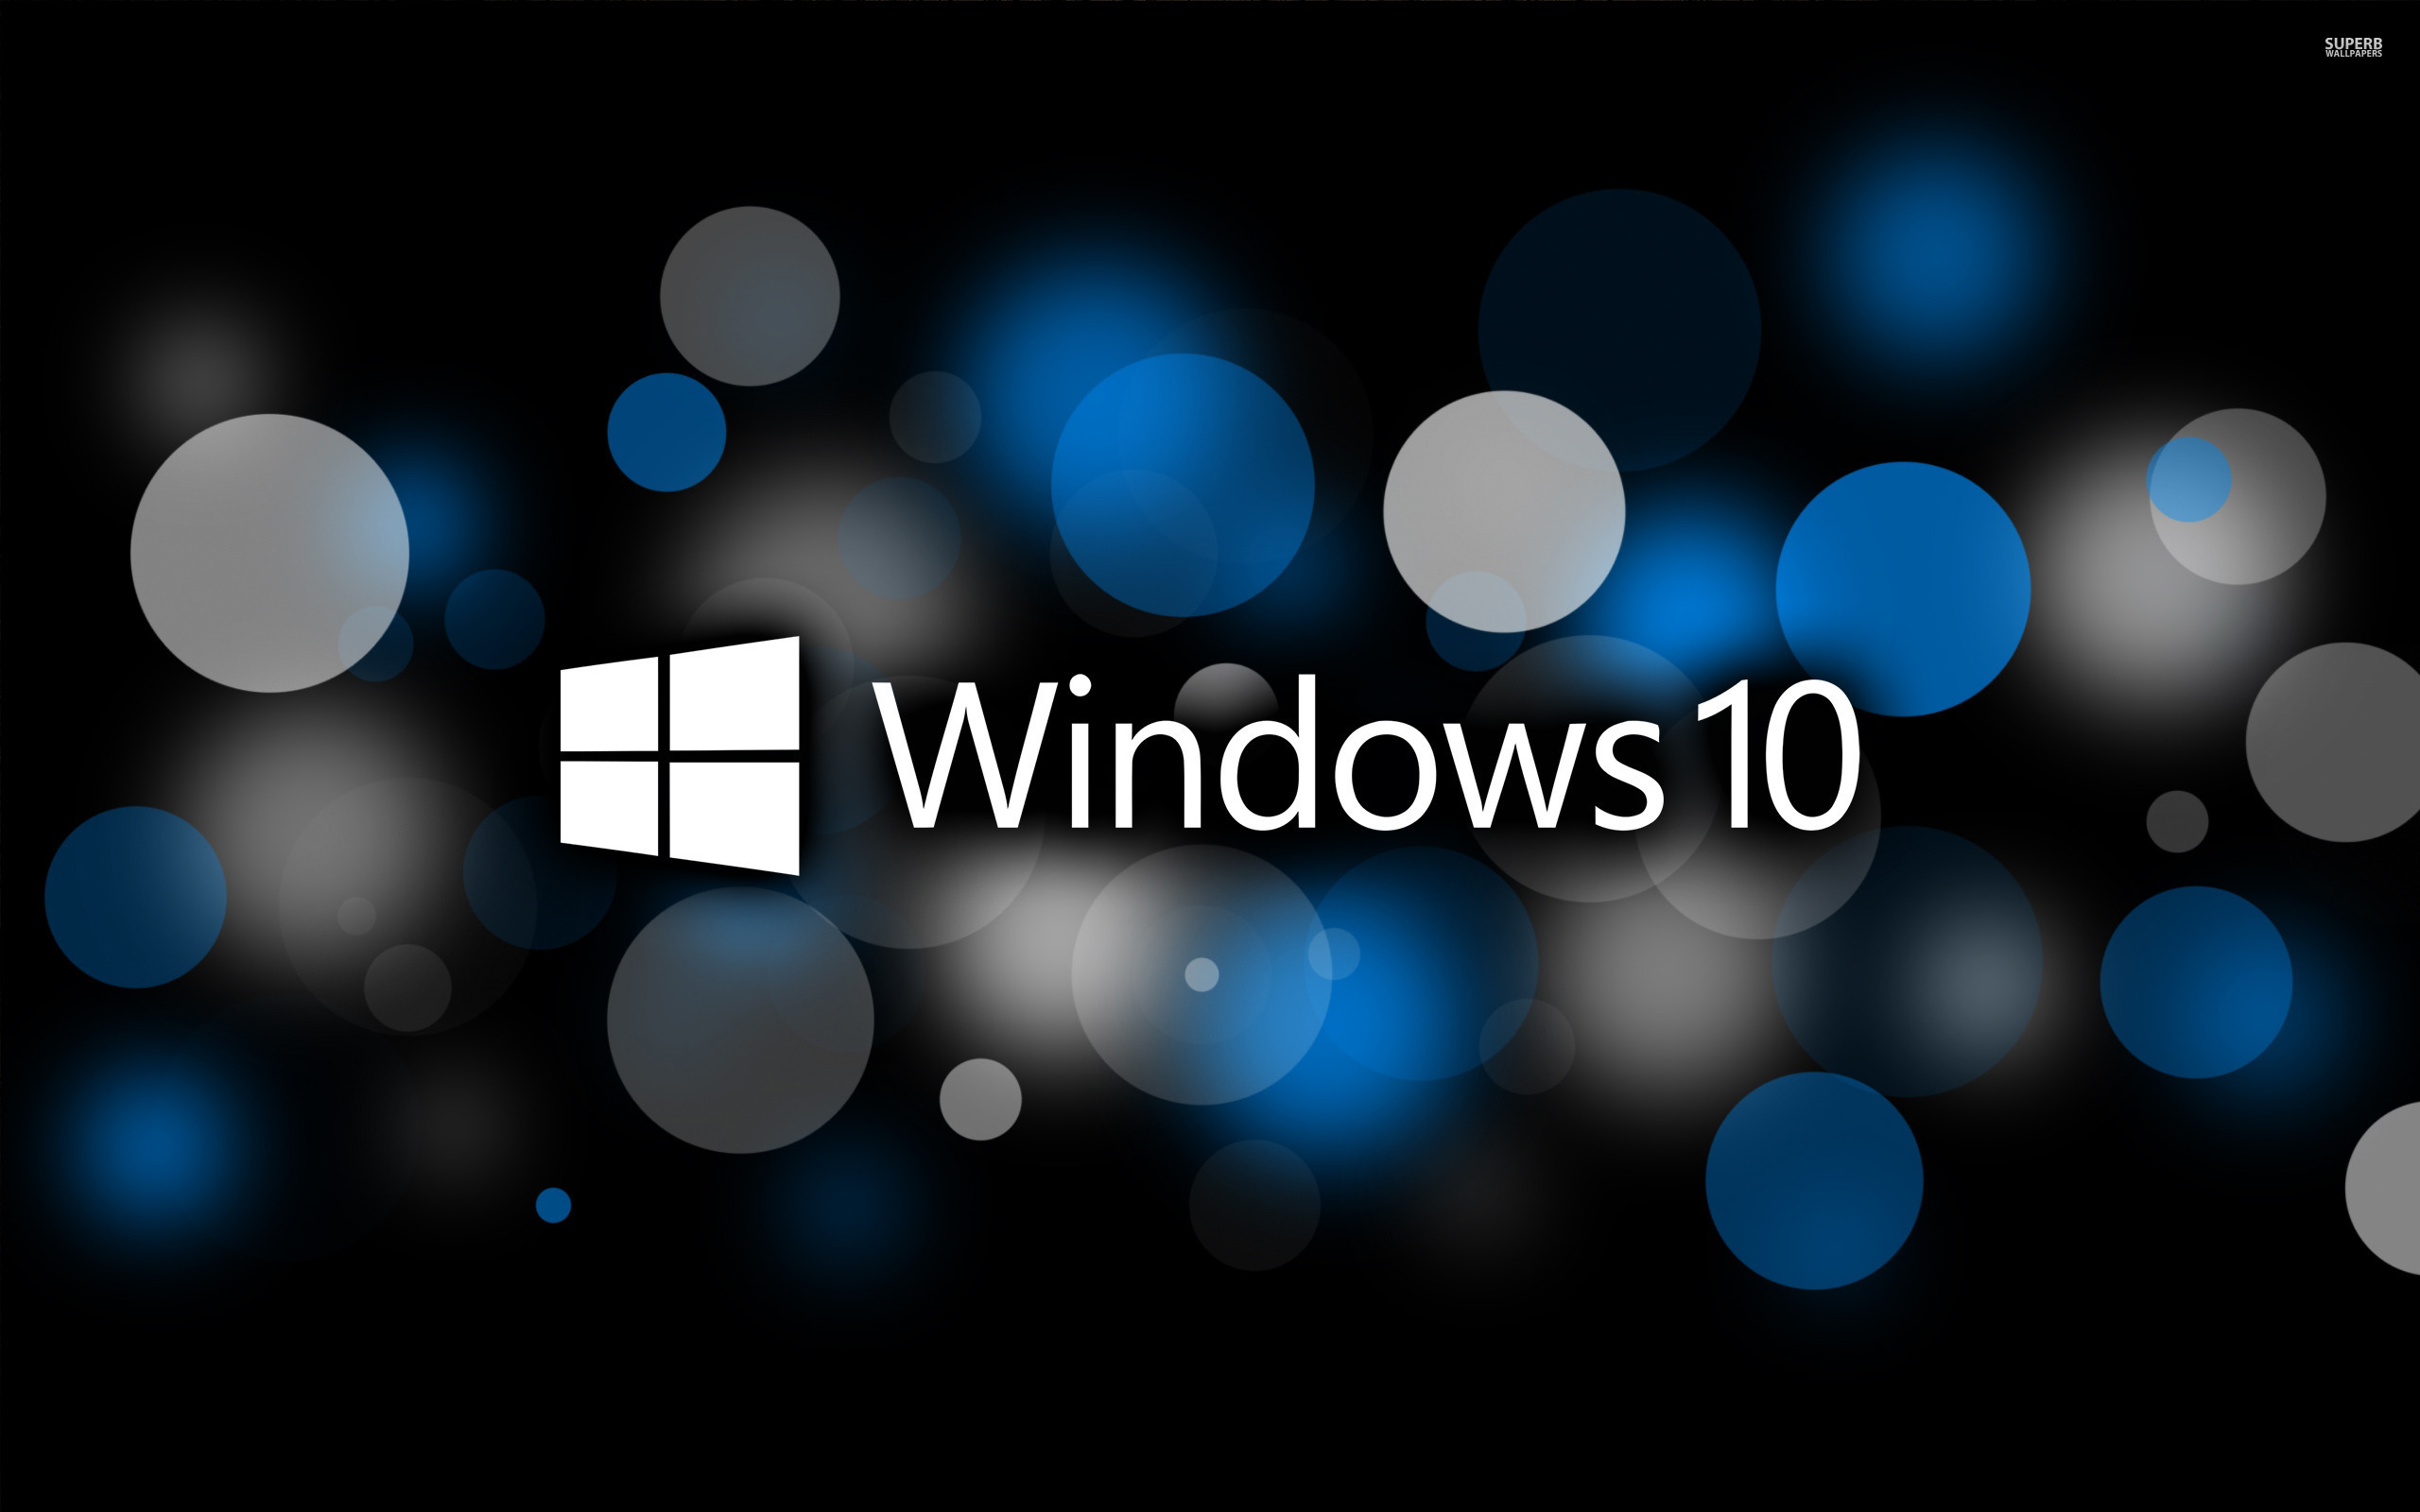 Windows 10 hd wallpaper wallpapersafari for 10 40 window definition